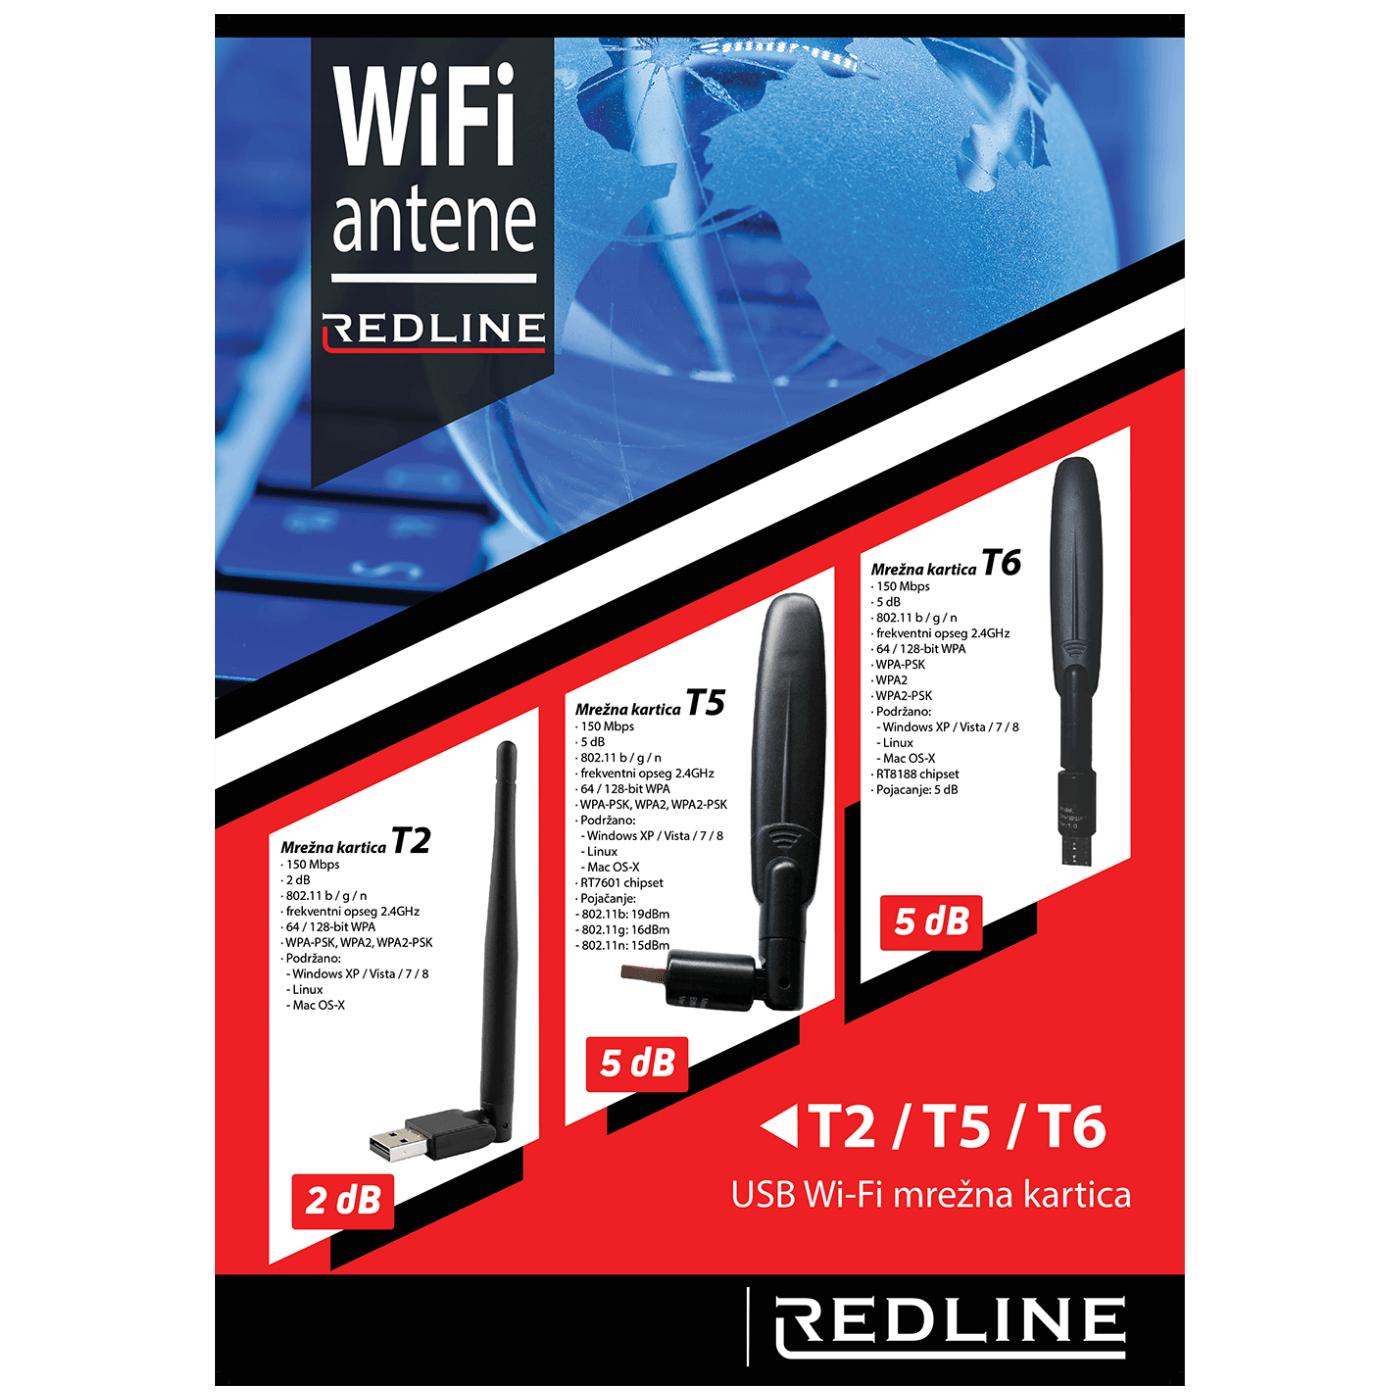 Wi-Fi mrežna kartica, USB, 2.4 GHz, 5 dB, 150 Mbps, RT7601